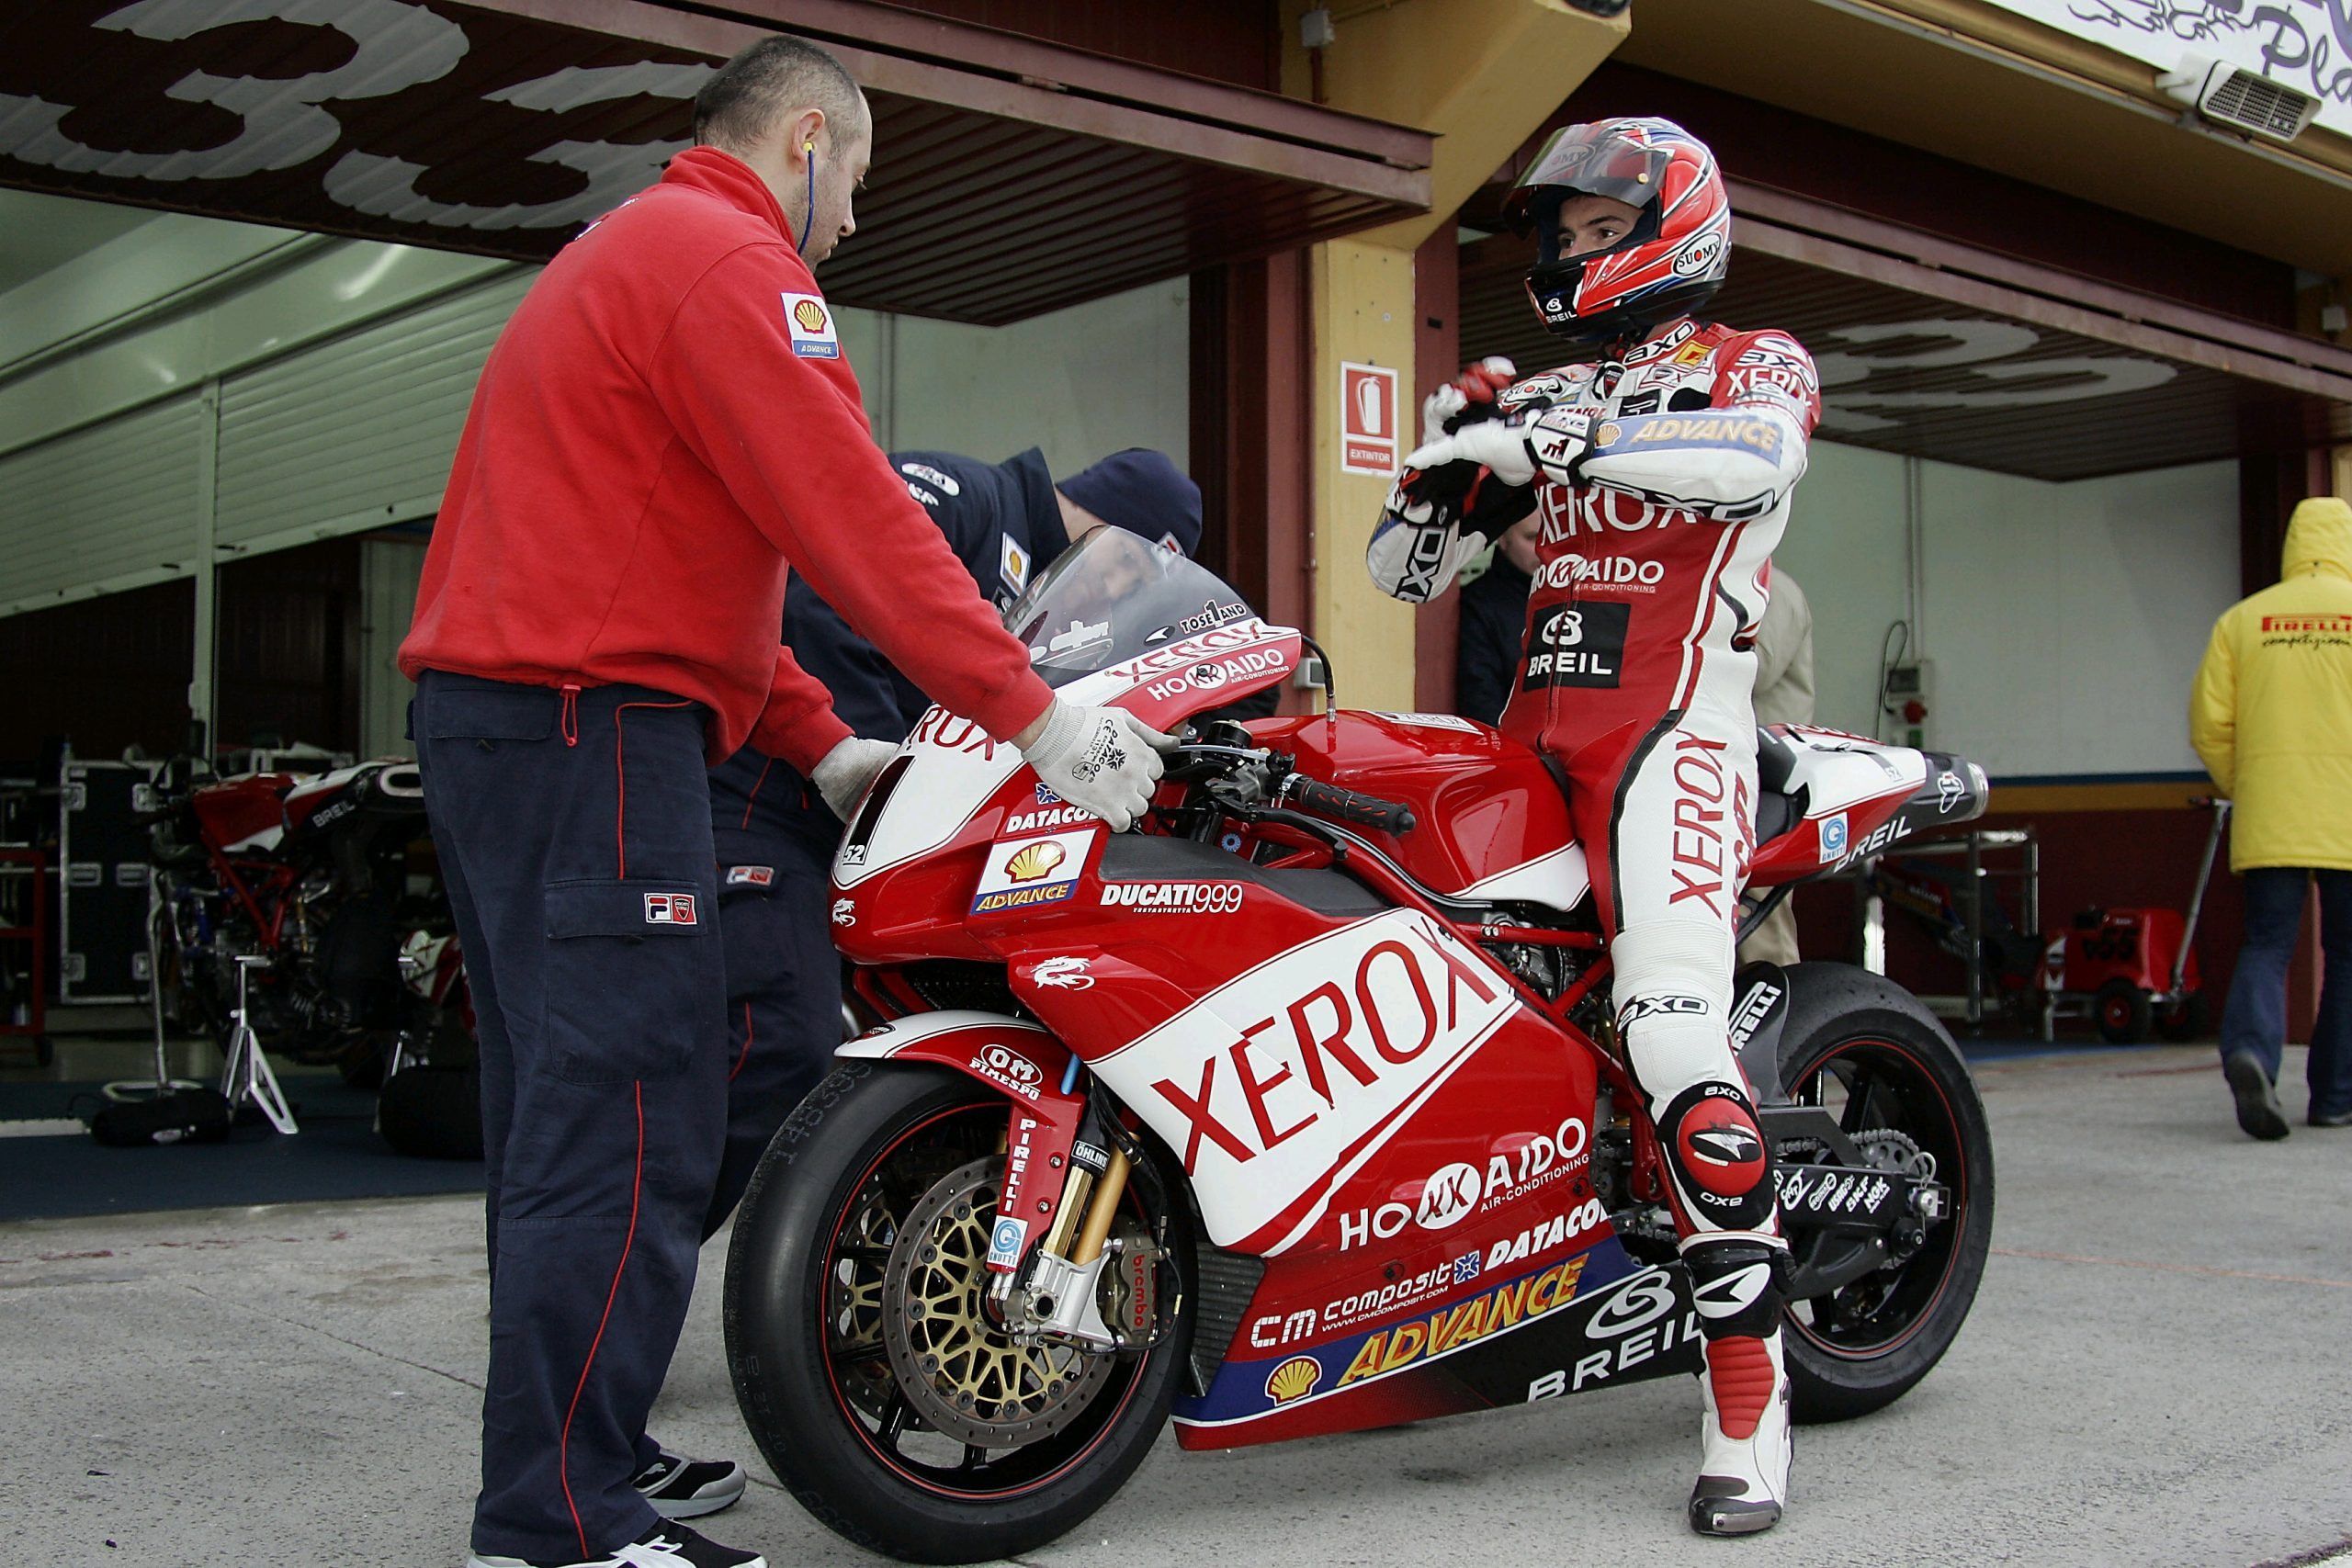 OM Ducati superbike sponsorship